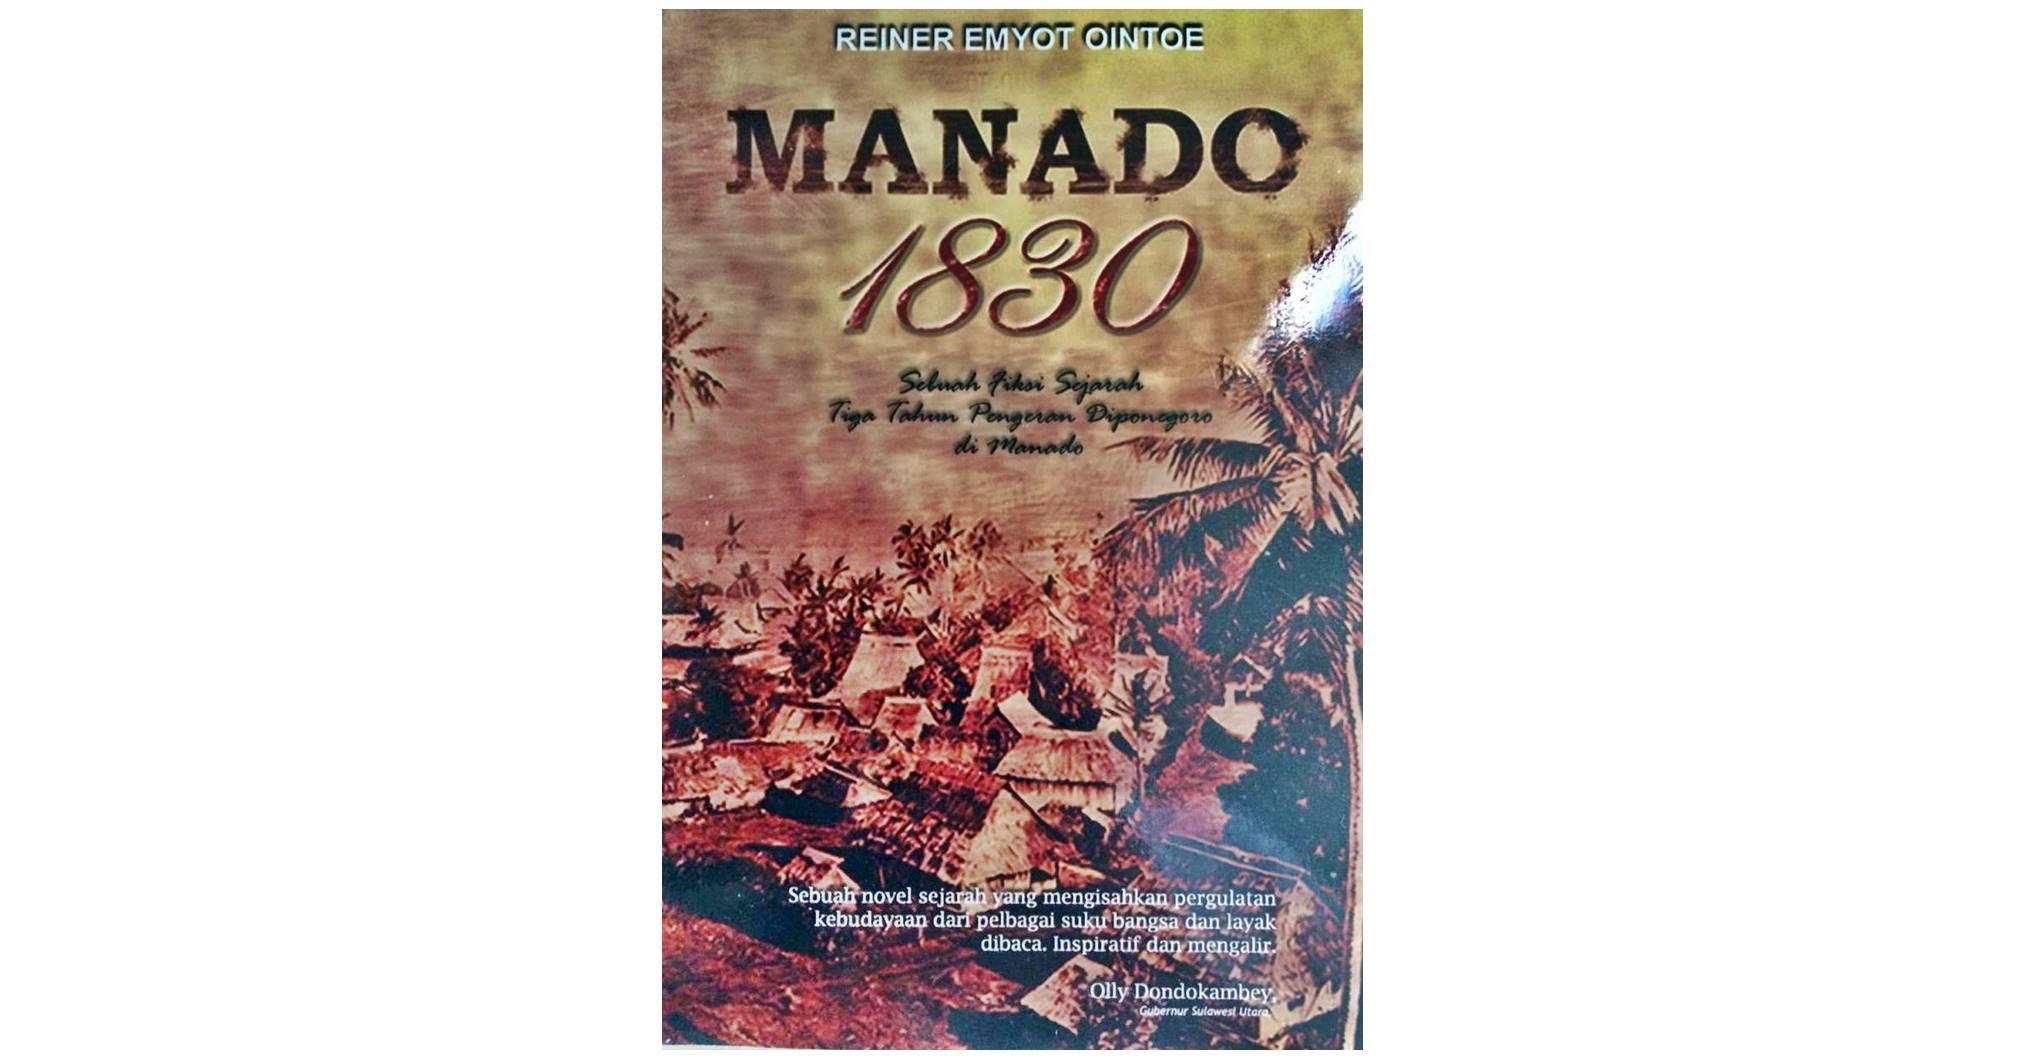 Manado (1830) Reiner Emyot Ointoe